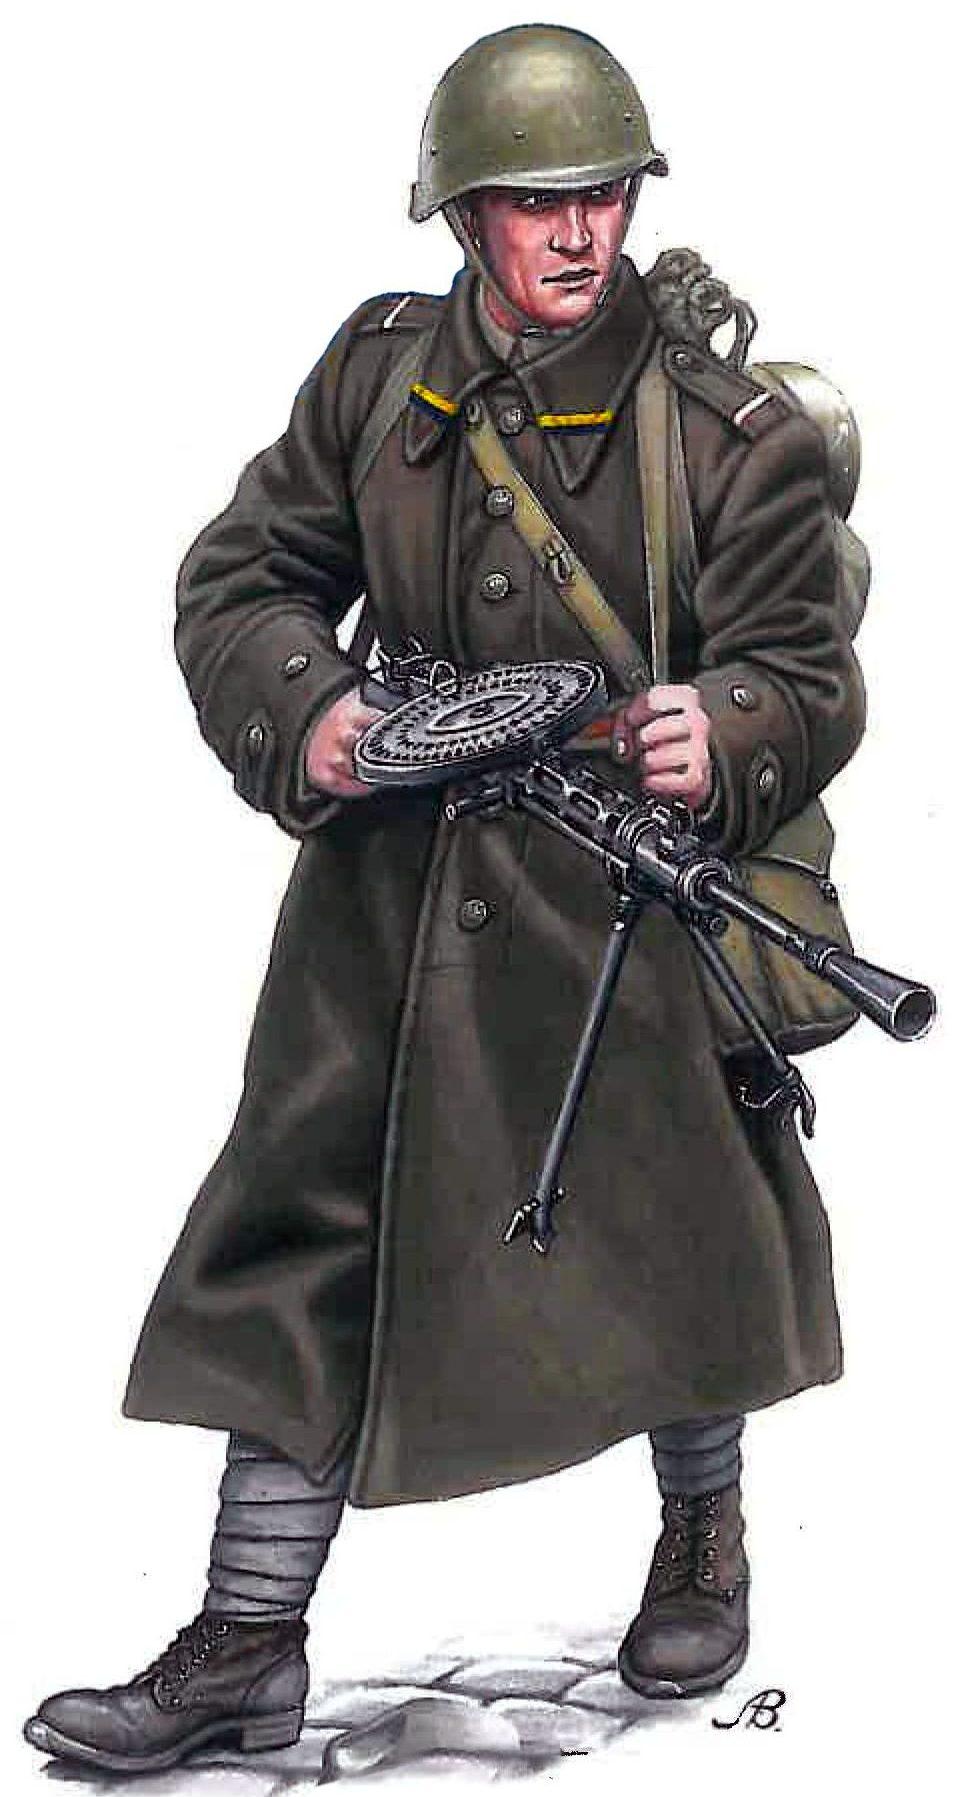 Bulczynki Arnold. Советский пулеметчик.